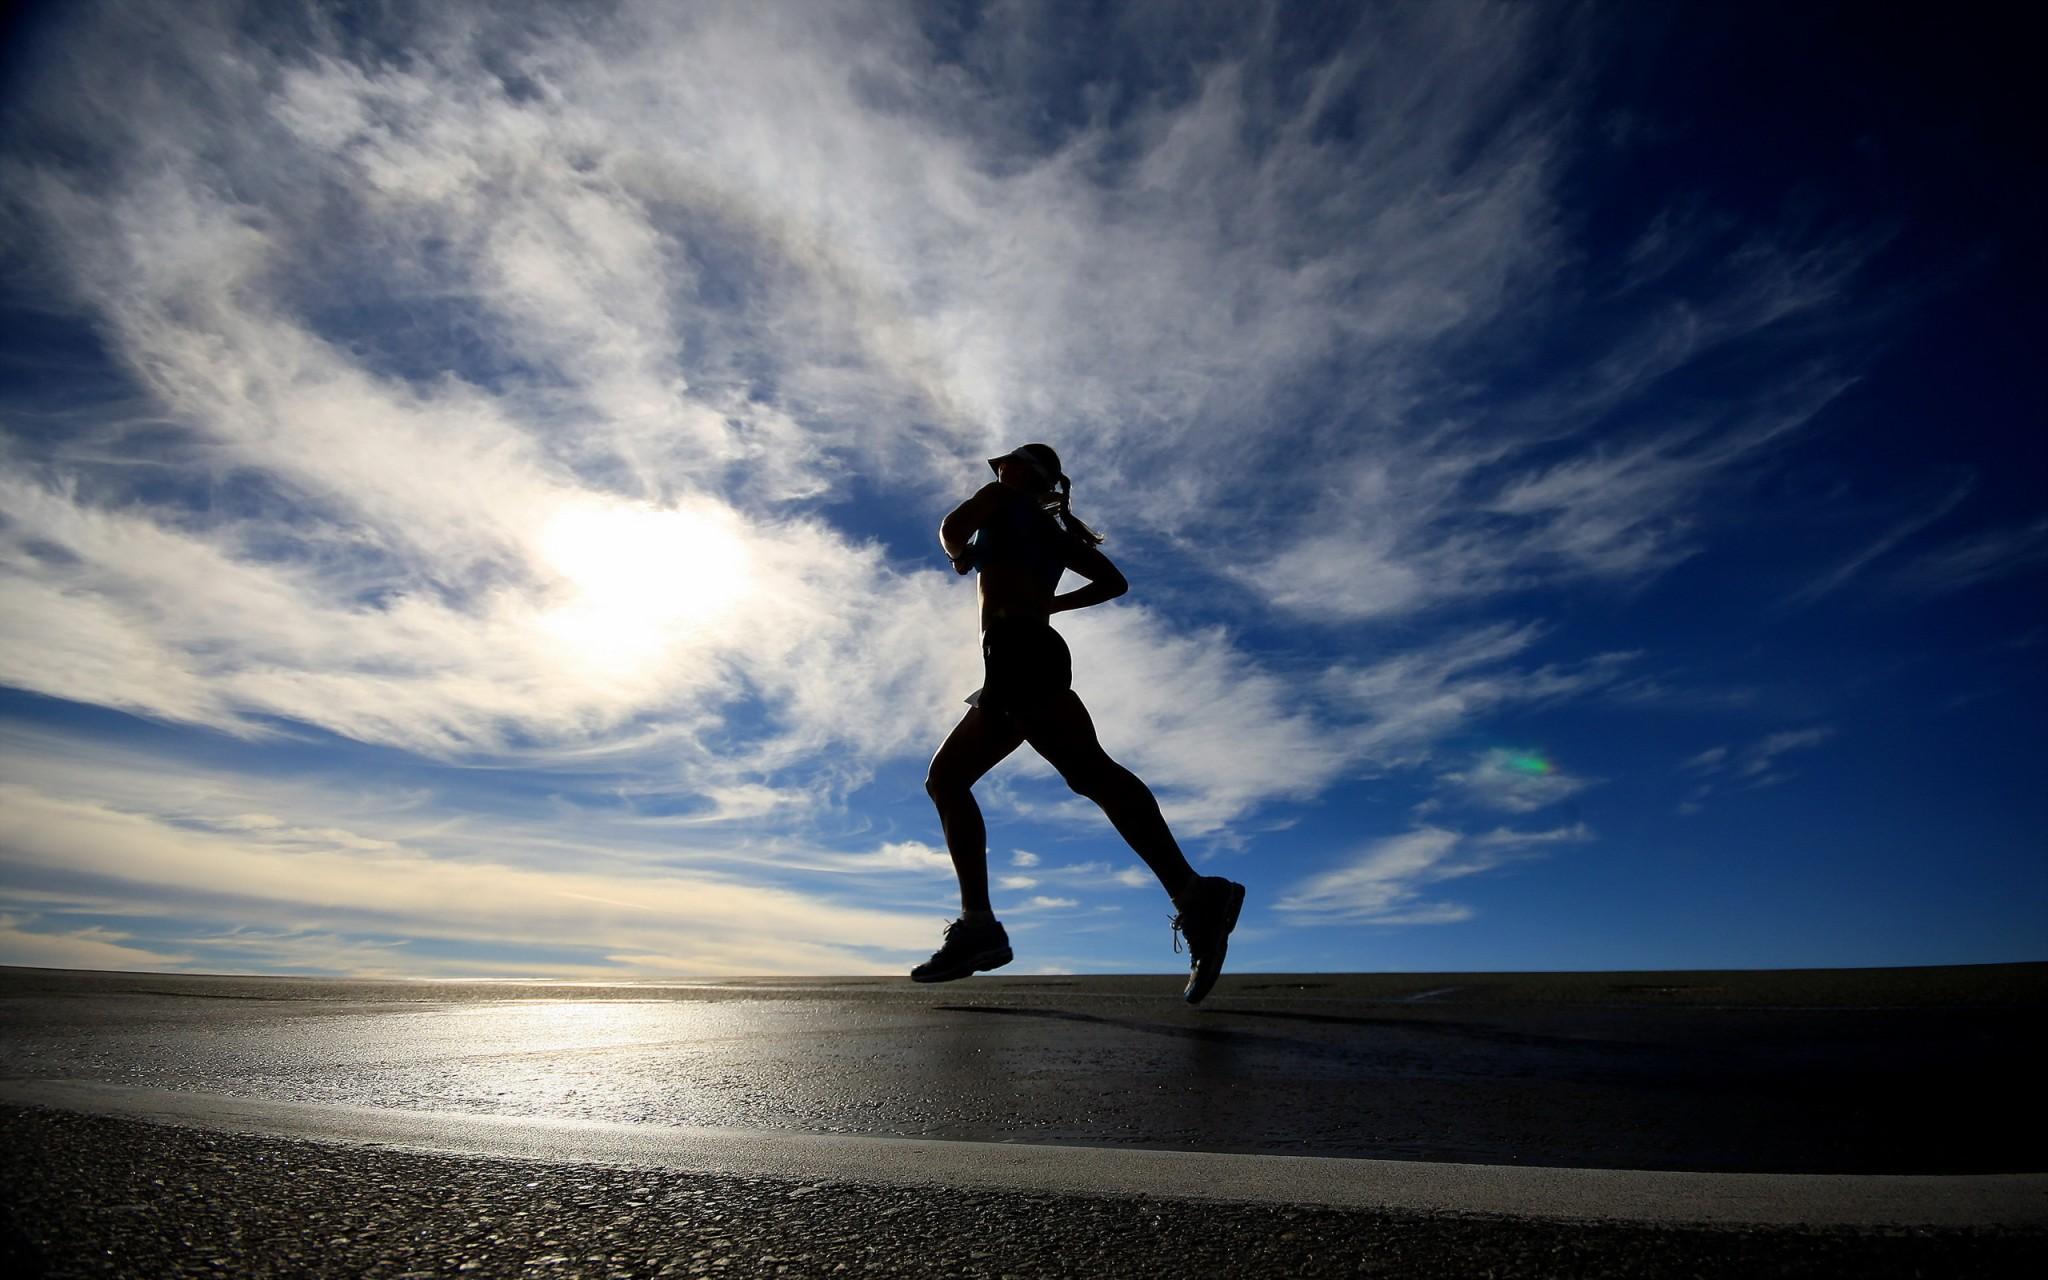 Sport Running Wallpaper Hd: The Running Word Cloud: A 2-minute Game For Runners